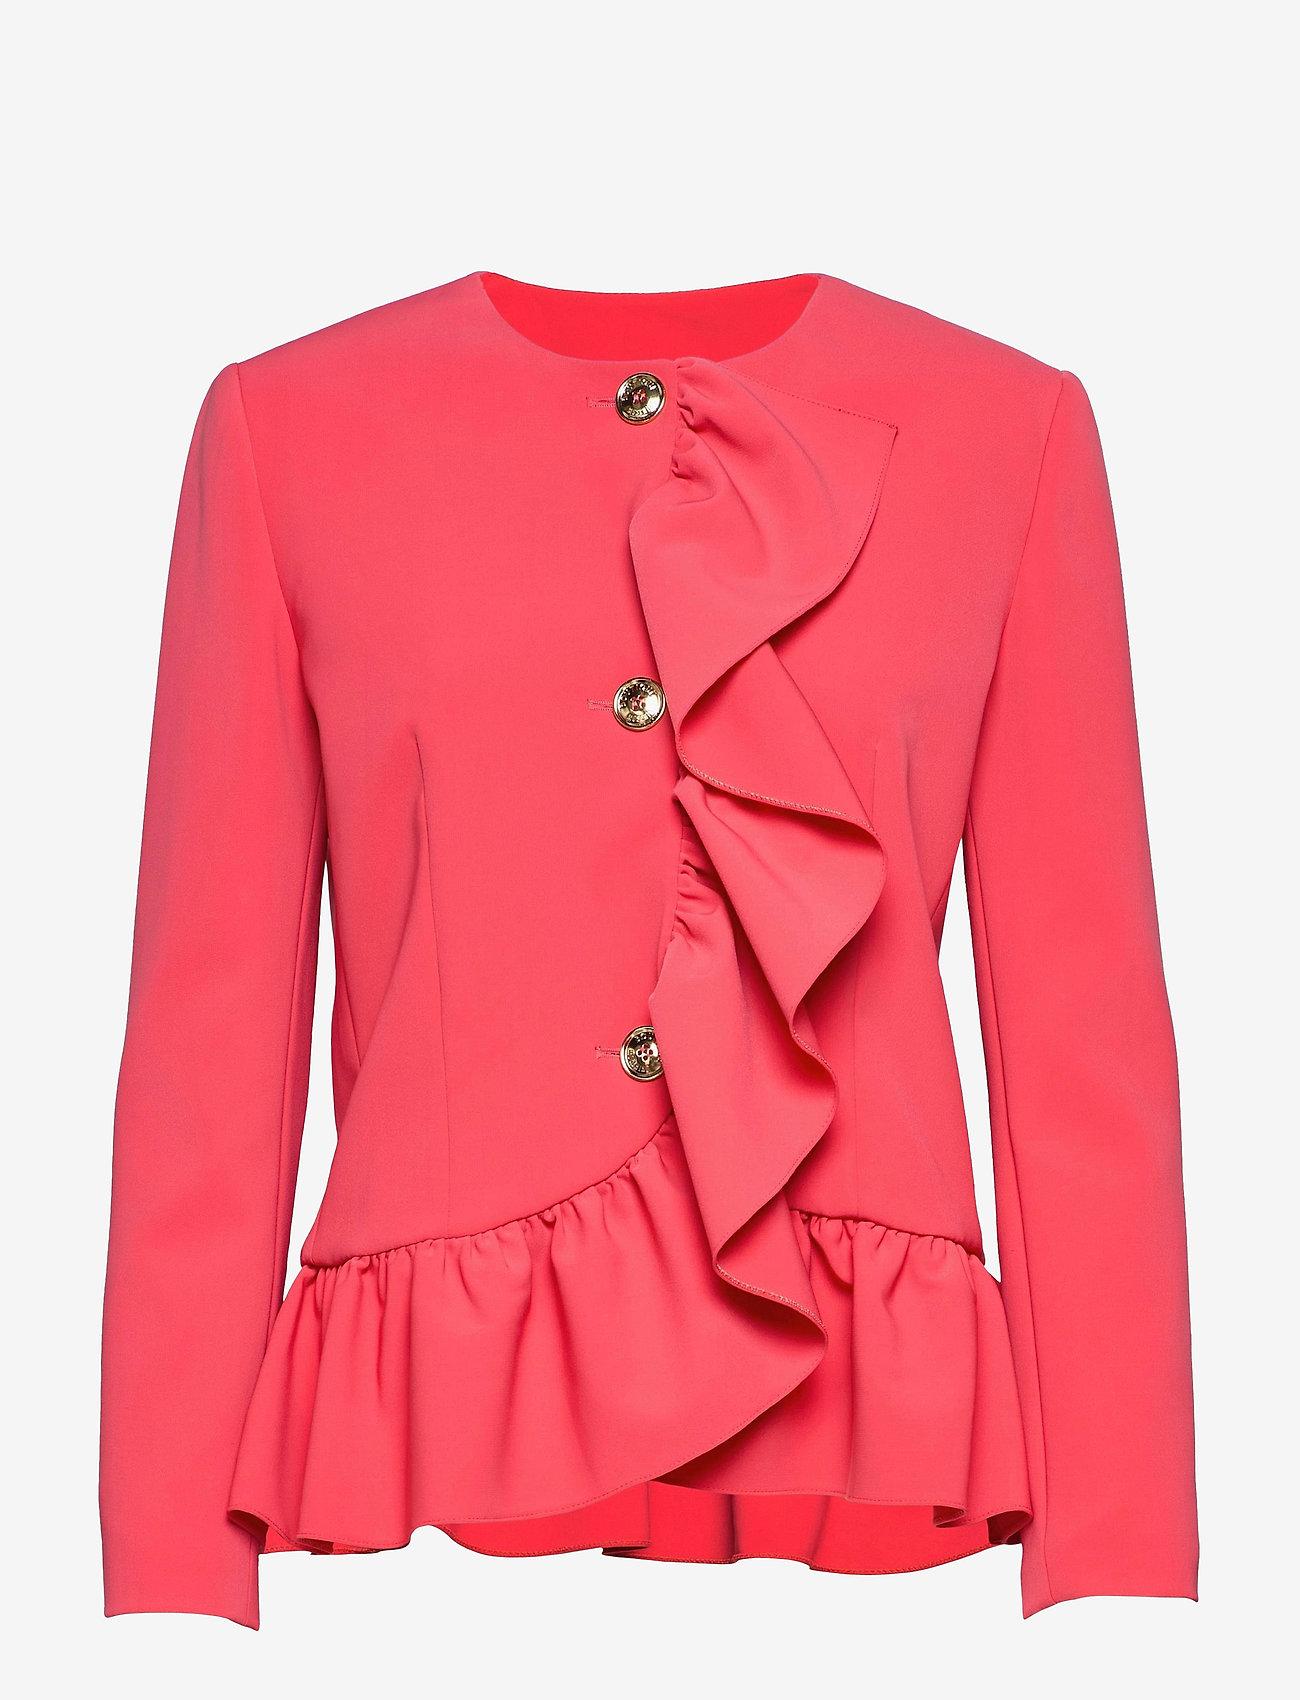 Boutique Moschino - Boutique Moschino JACKET - tøj - pink - 0